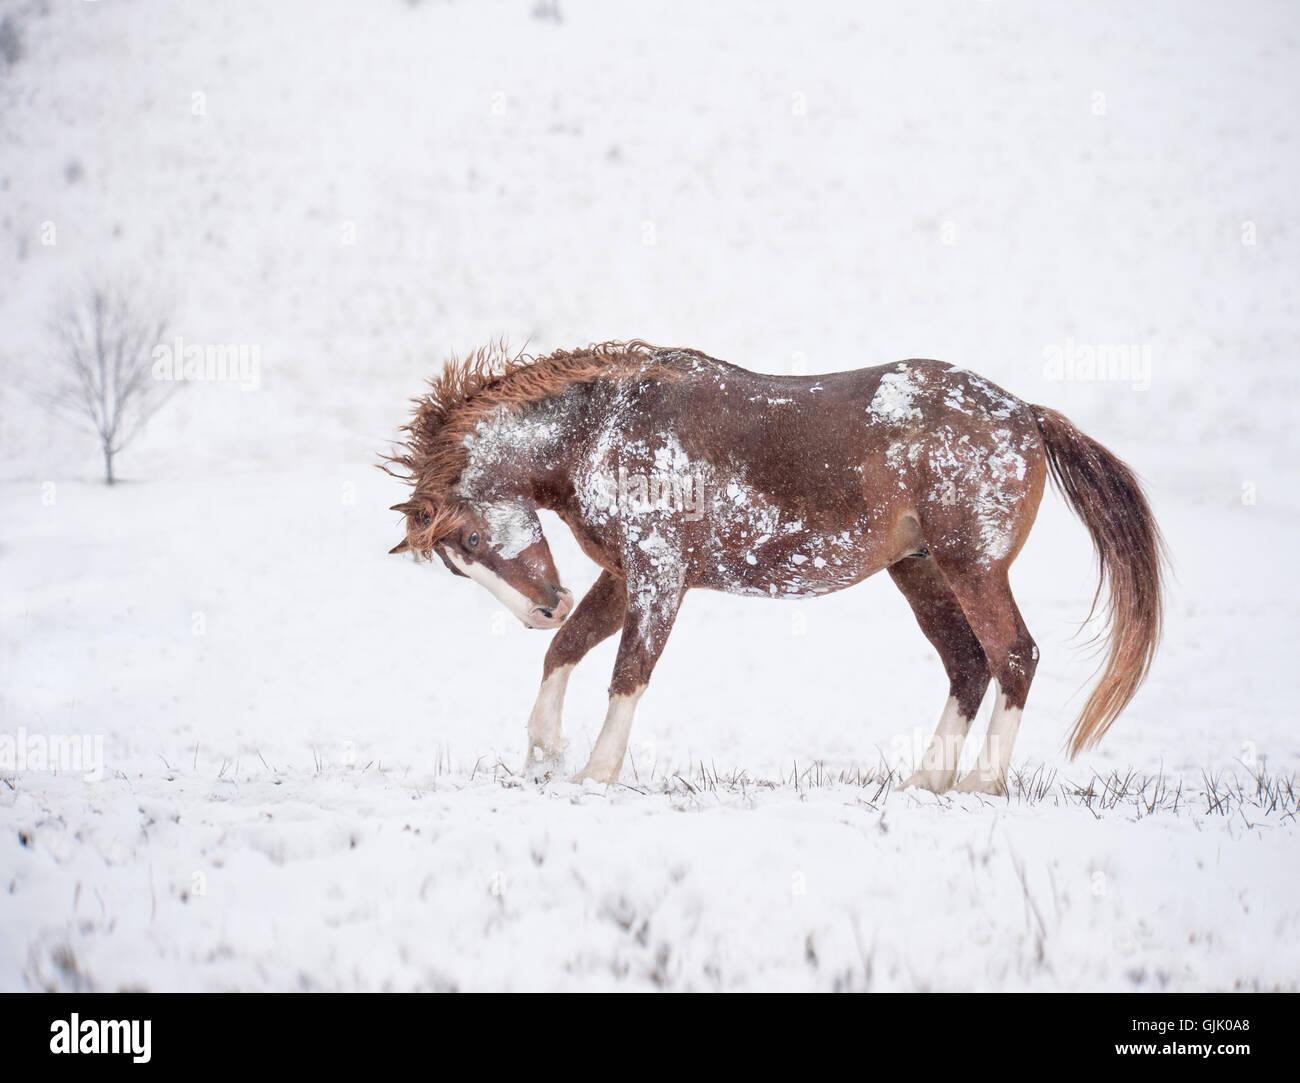 Warmblood stallion getting frisky in snow - Stock Image